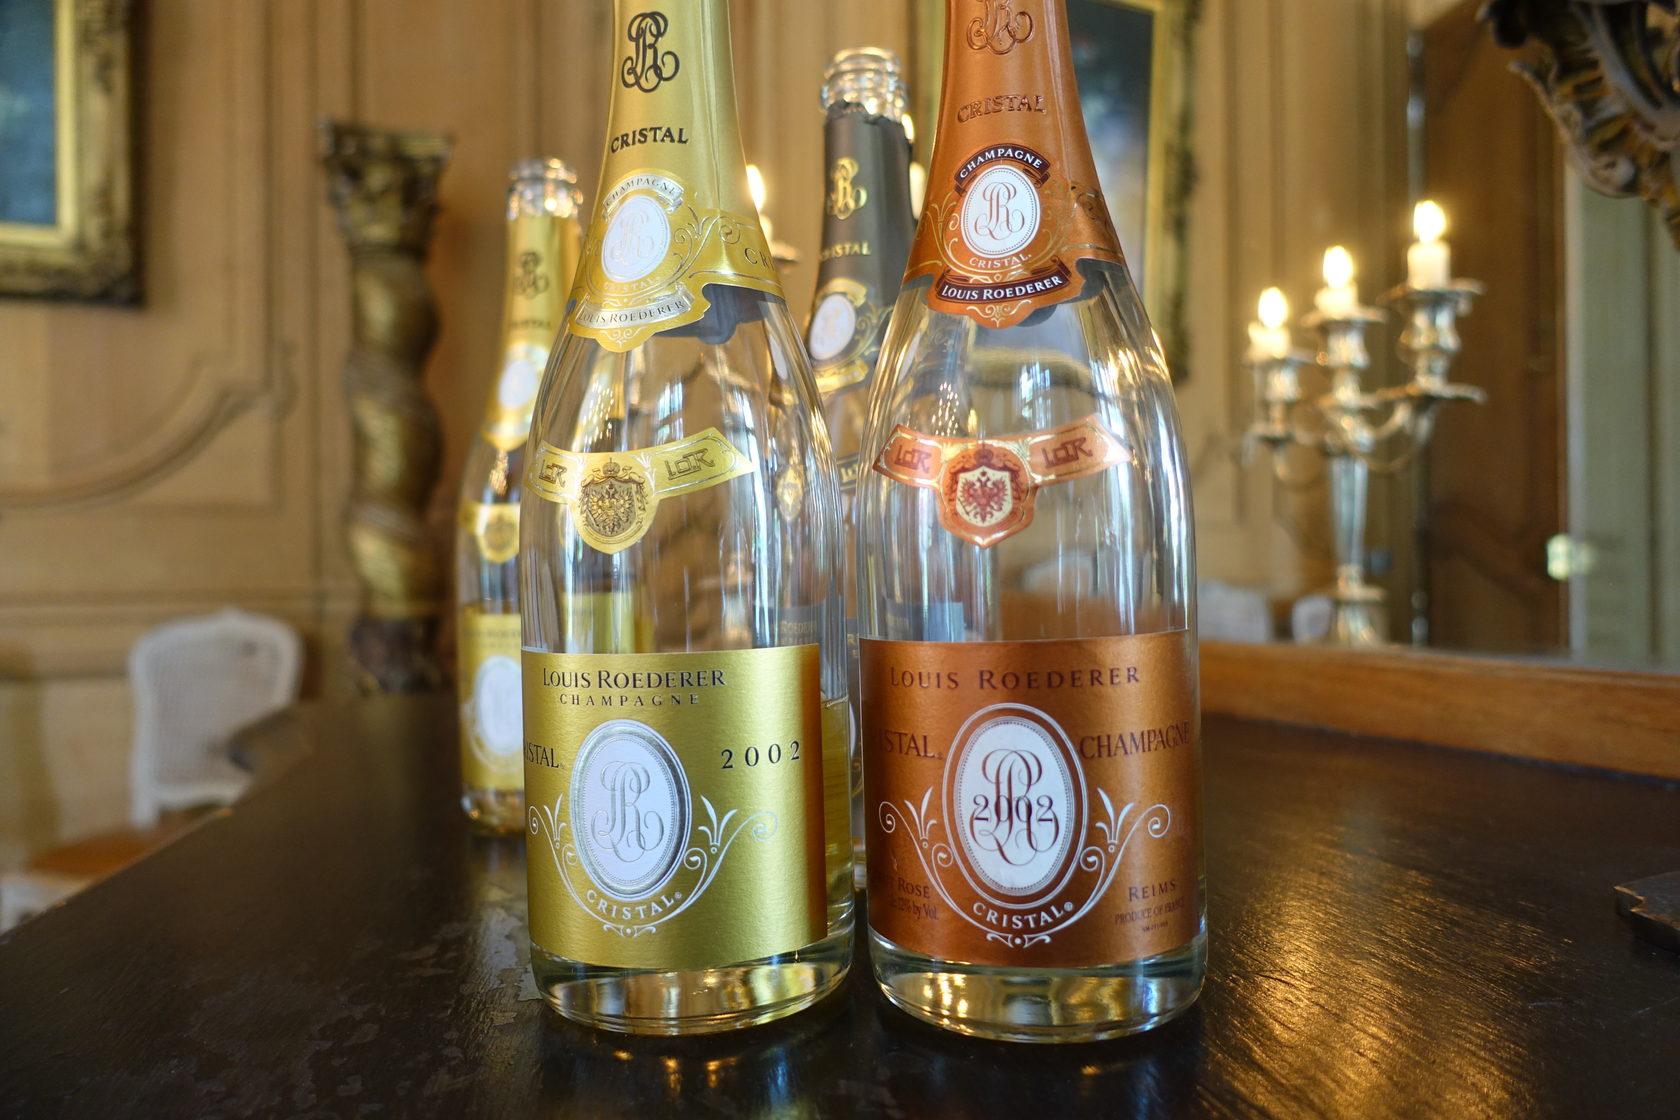 Champagne Louis Roederer 2002 Cristal and Cristal Rosé